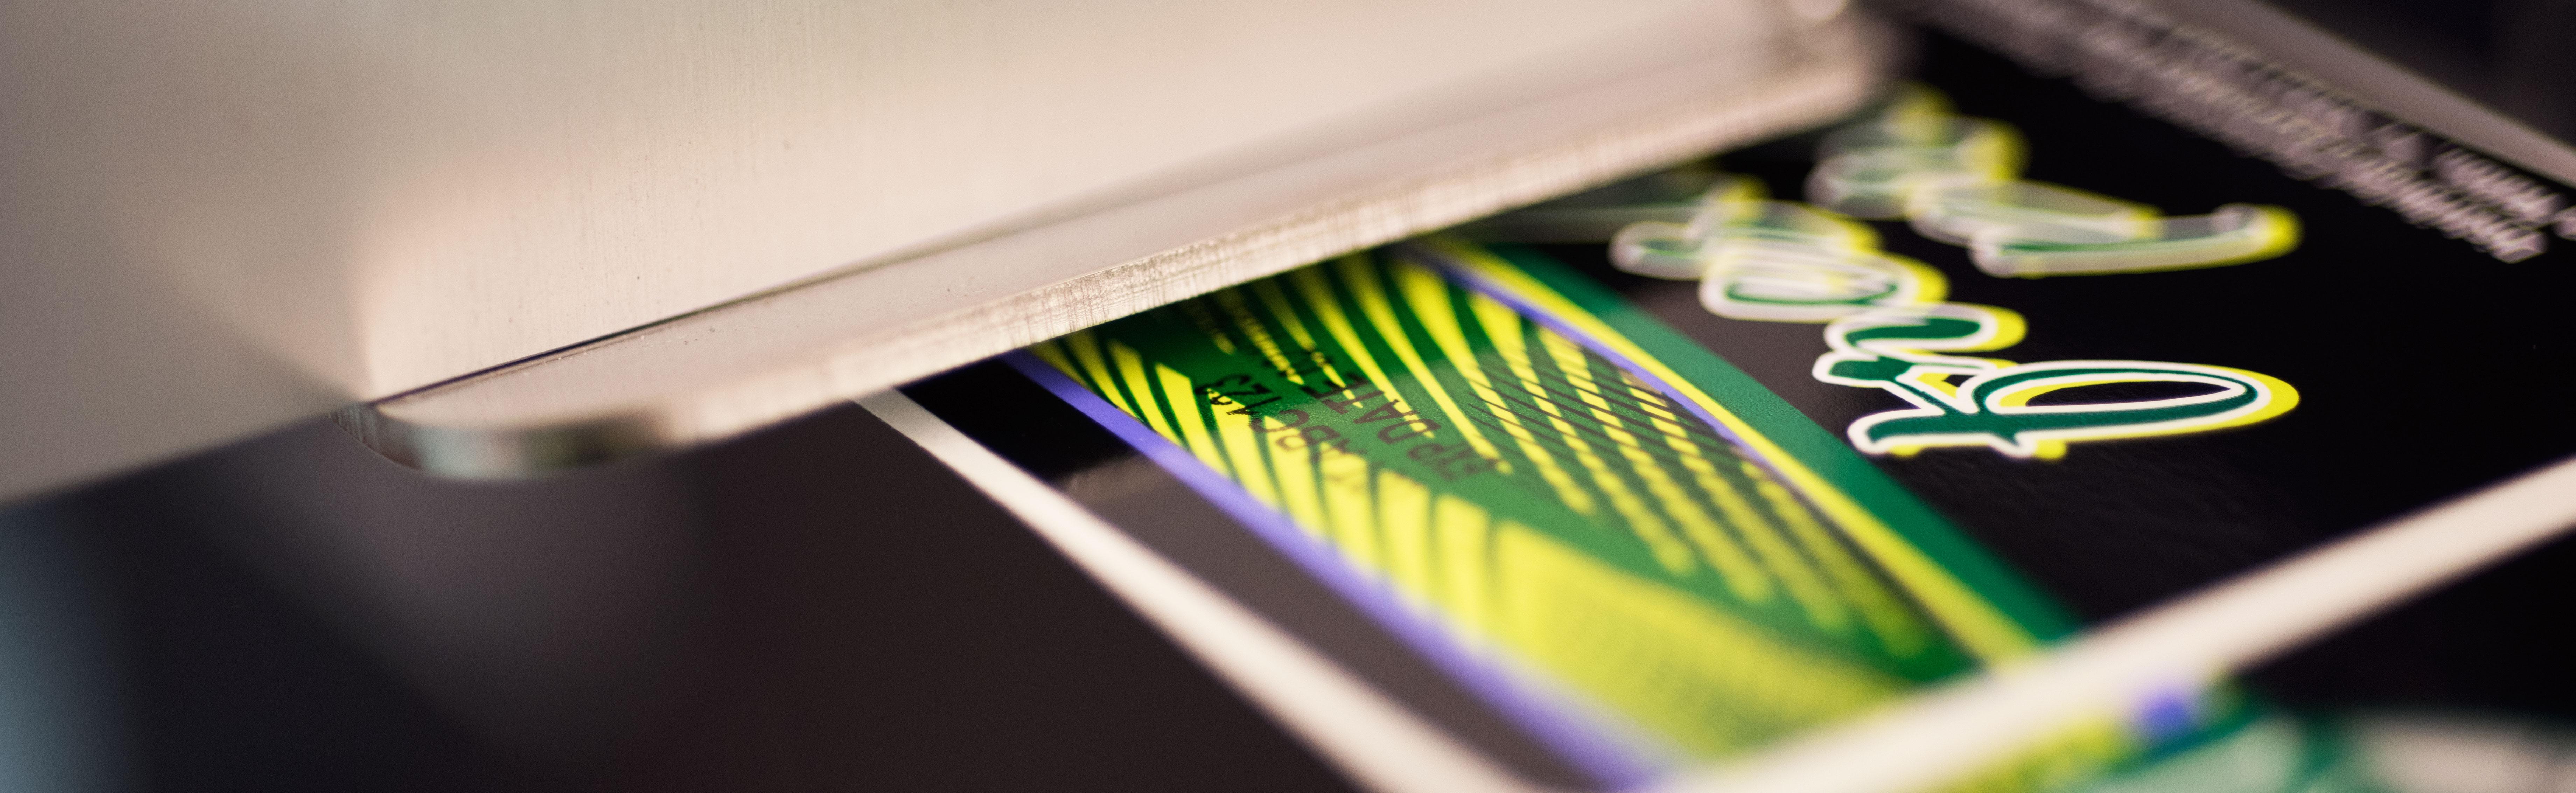 Thermal ink jet printing